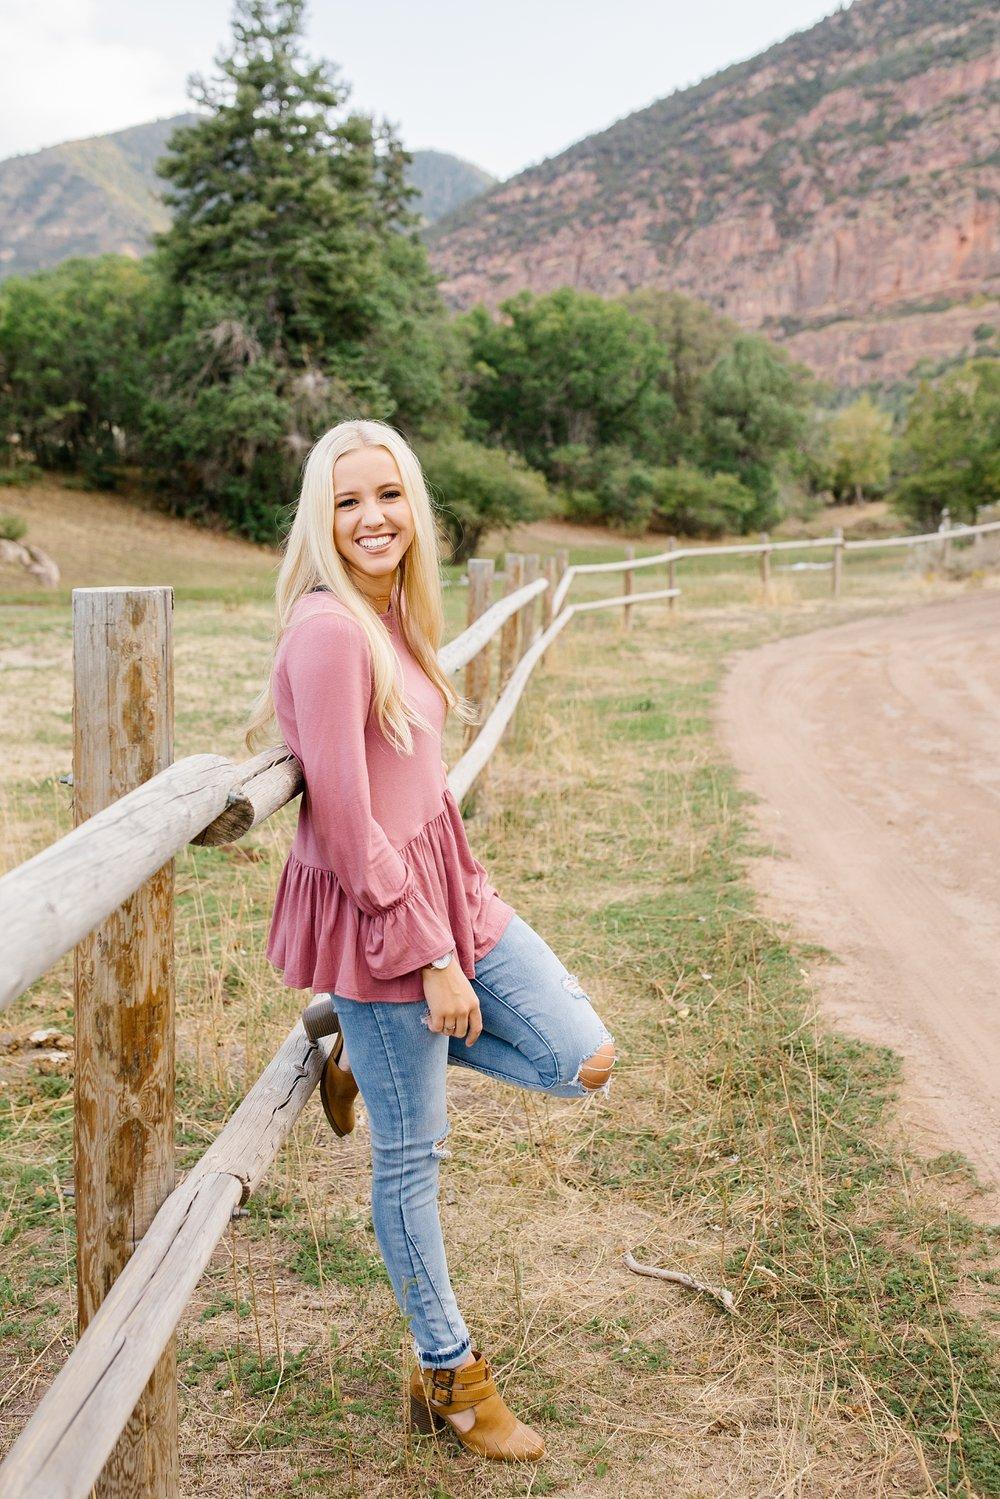 Foote-103_Lizzie-B-Imagery-Utah-Family-Photographer-Lifestyle-Photography-Salt-Lake-City-Park-City-Utah-County.jpg